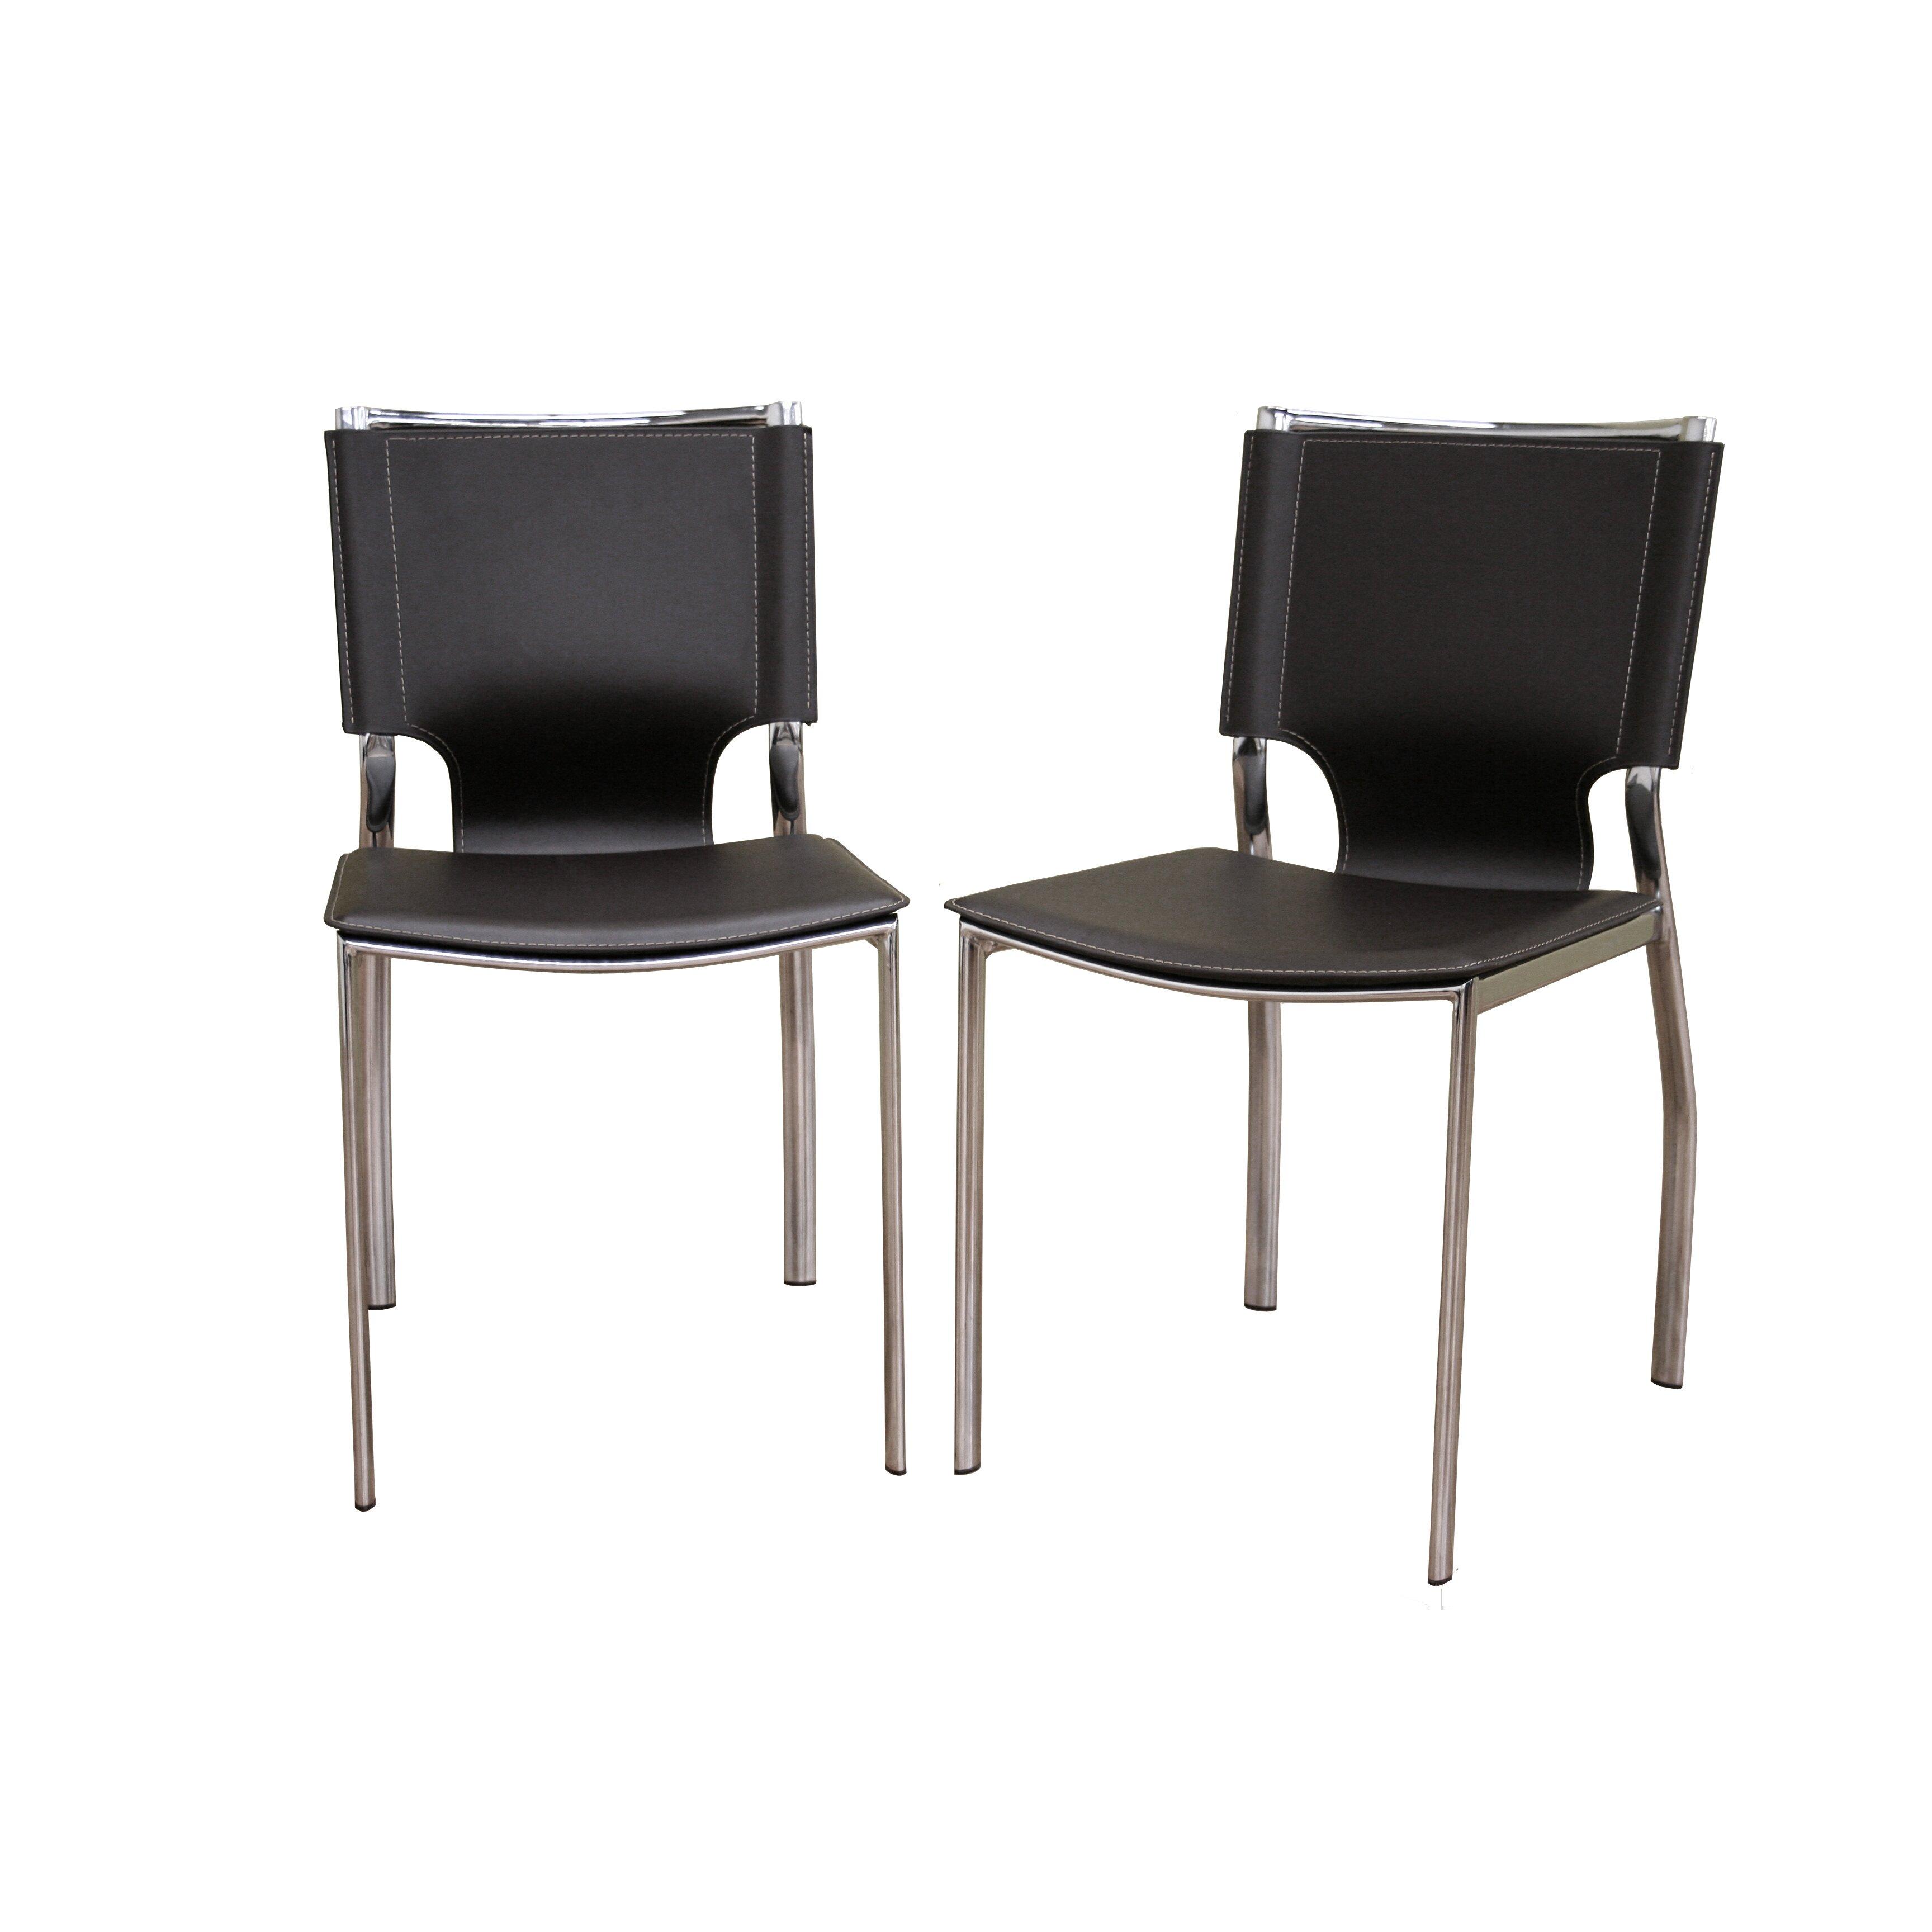 Wholesale Interiors Baxton Studio Montclare Side Chair